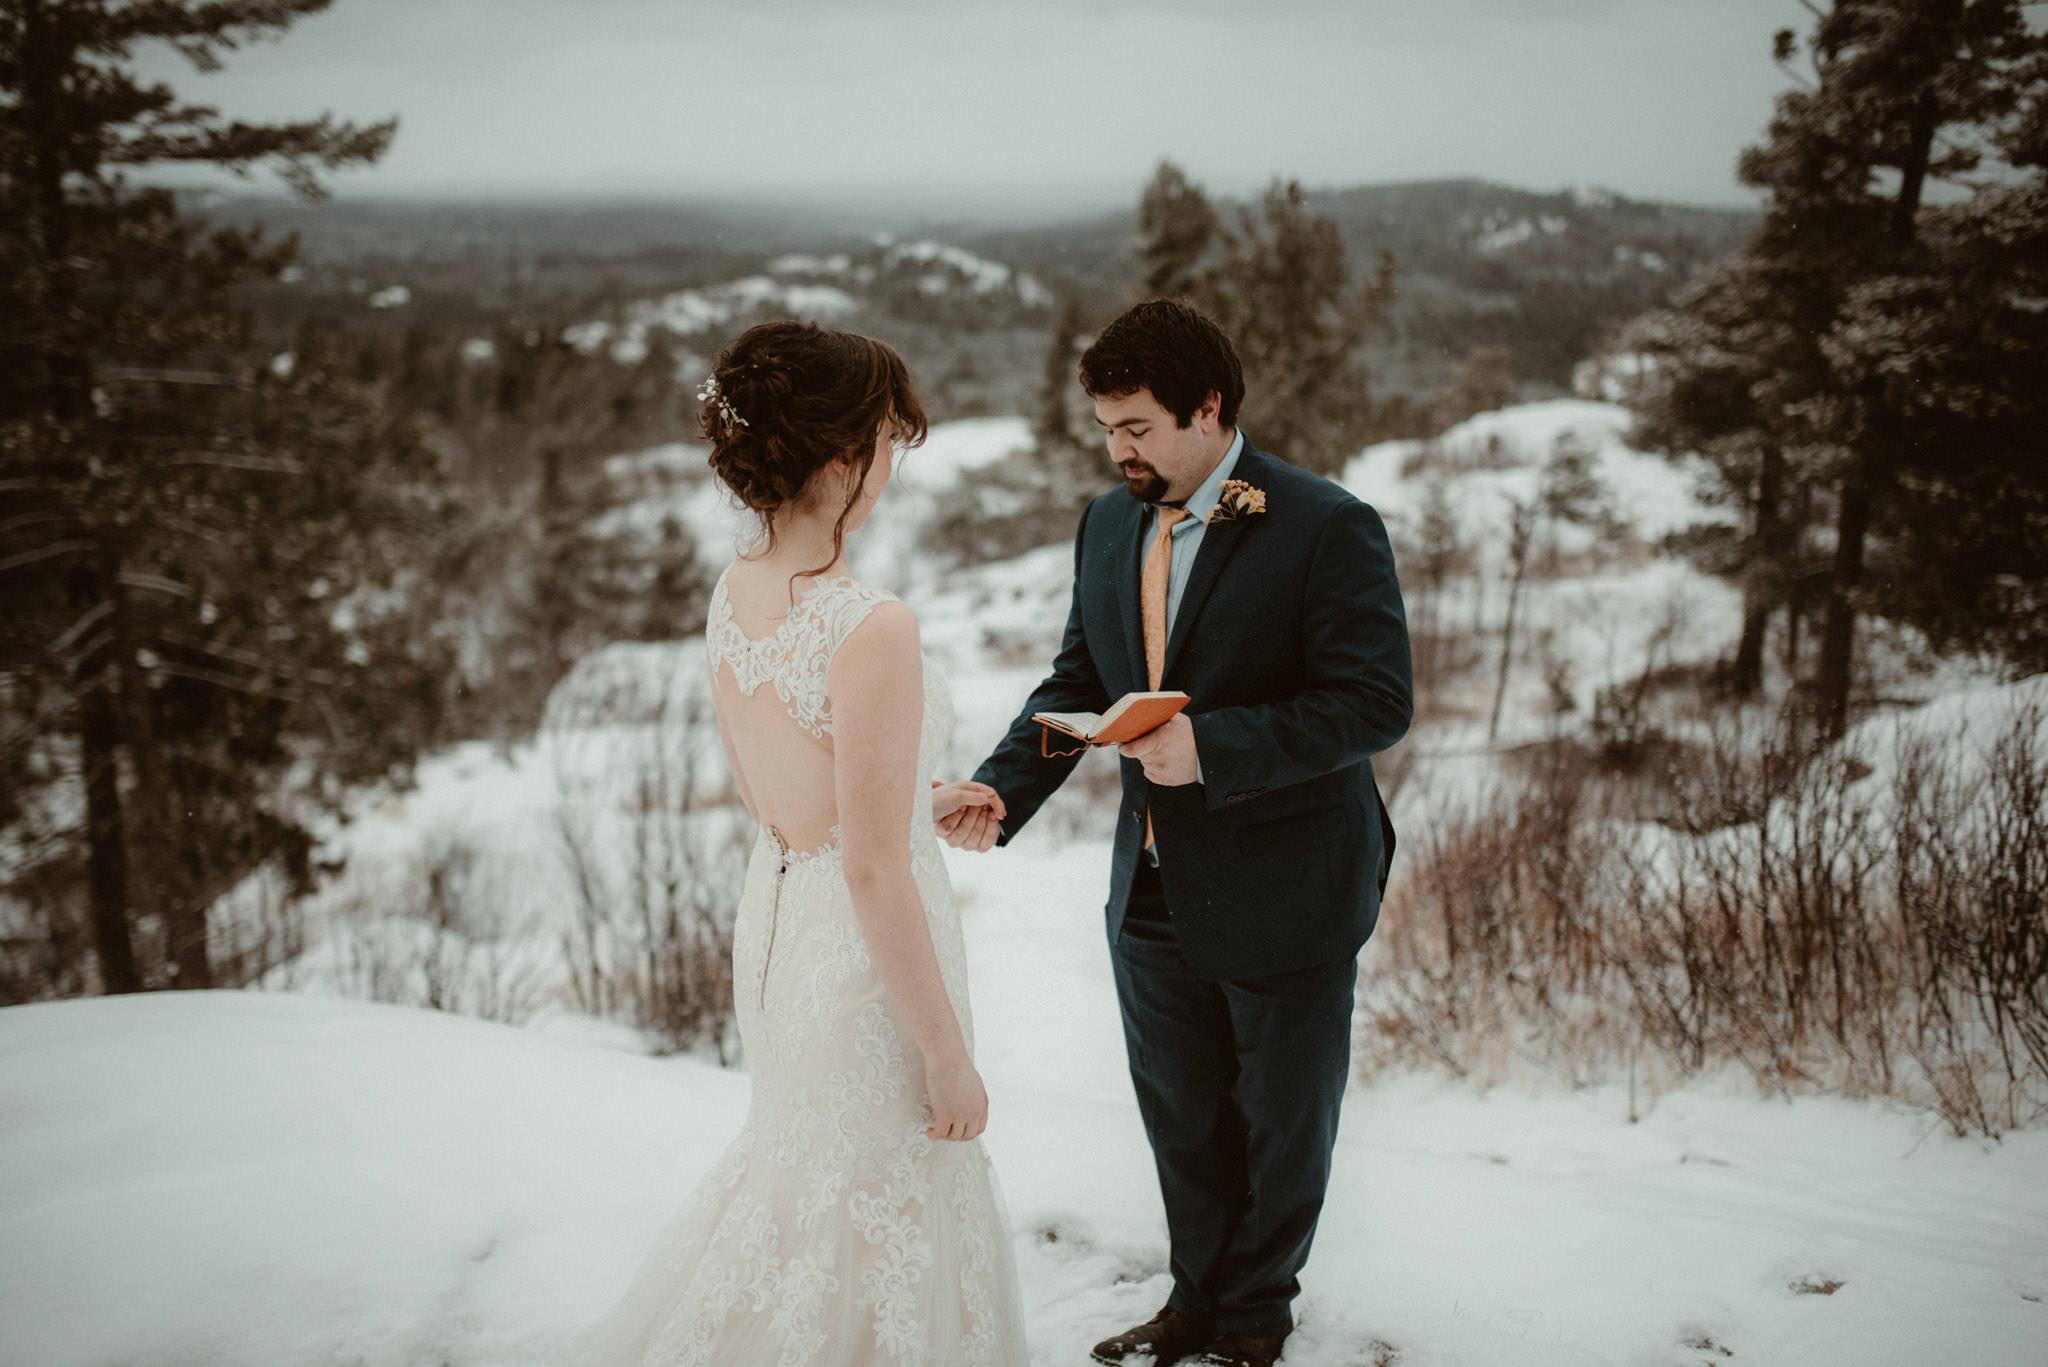 Winter elopement on Sugarloaf Mountain in Marquette, MI